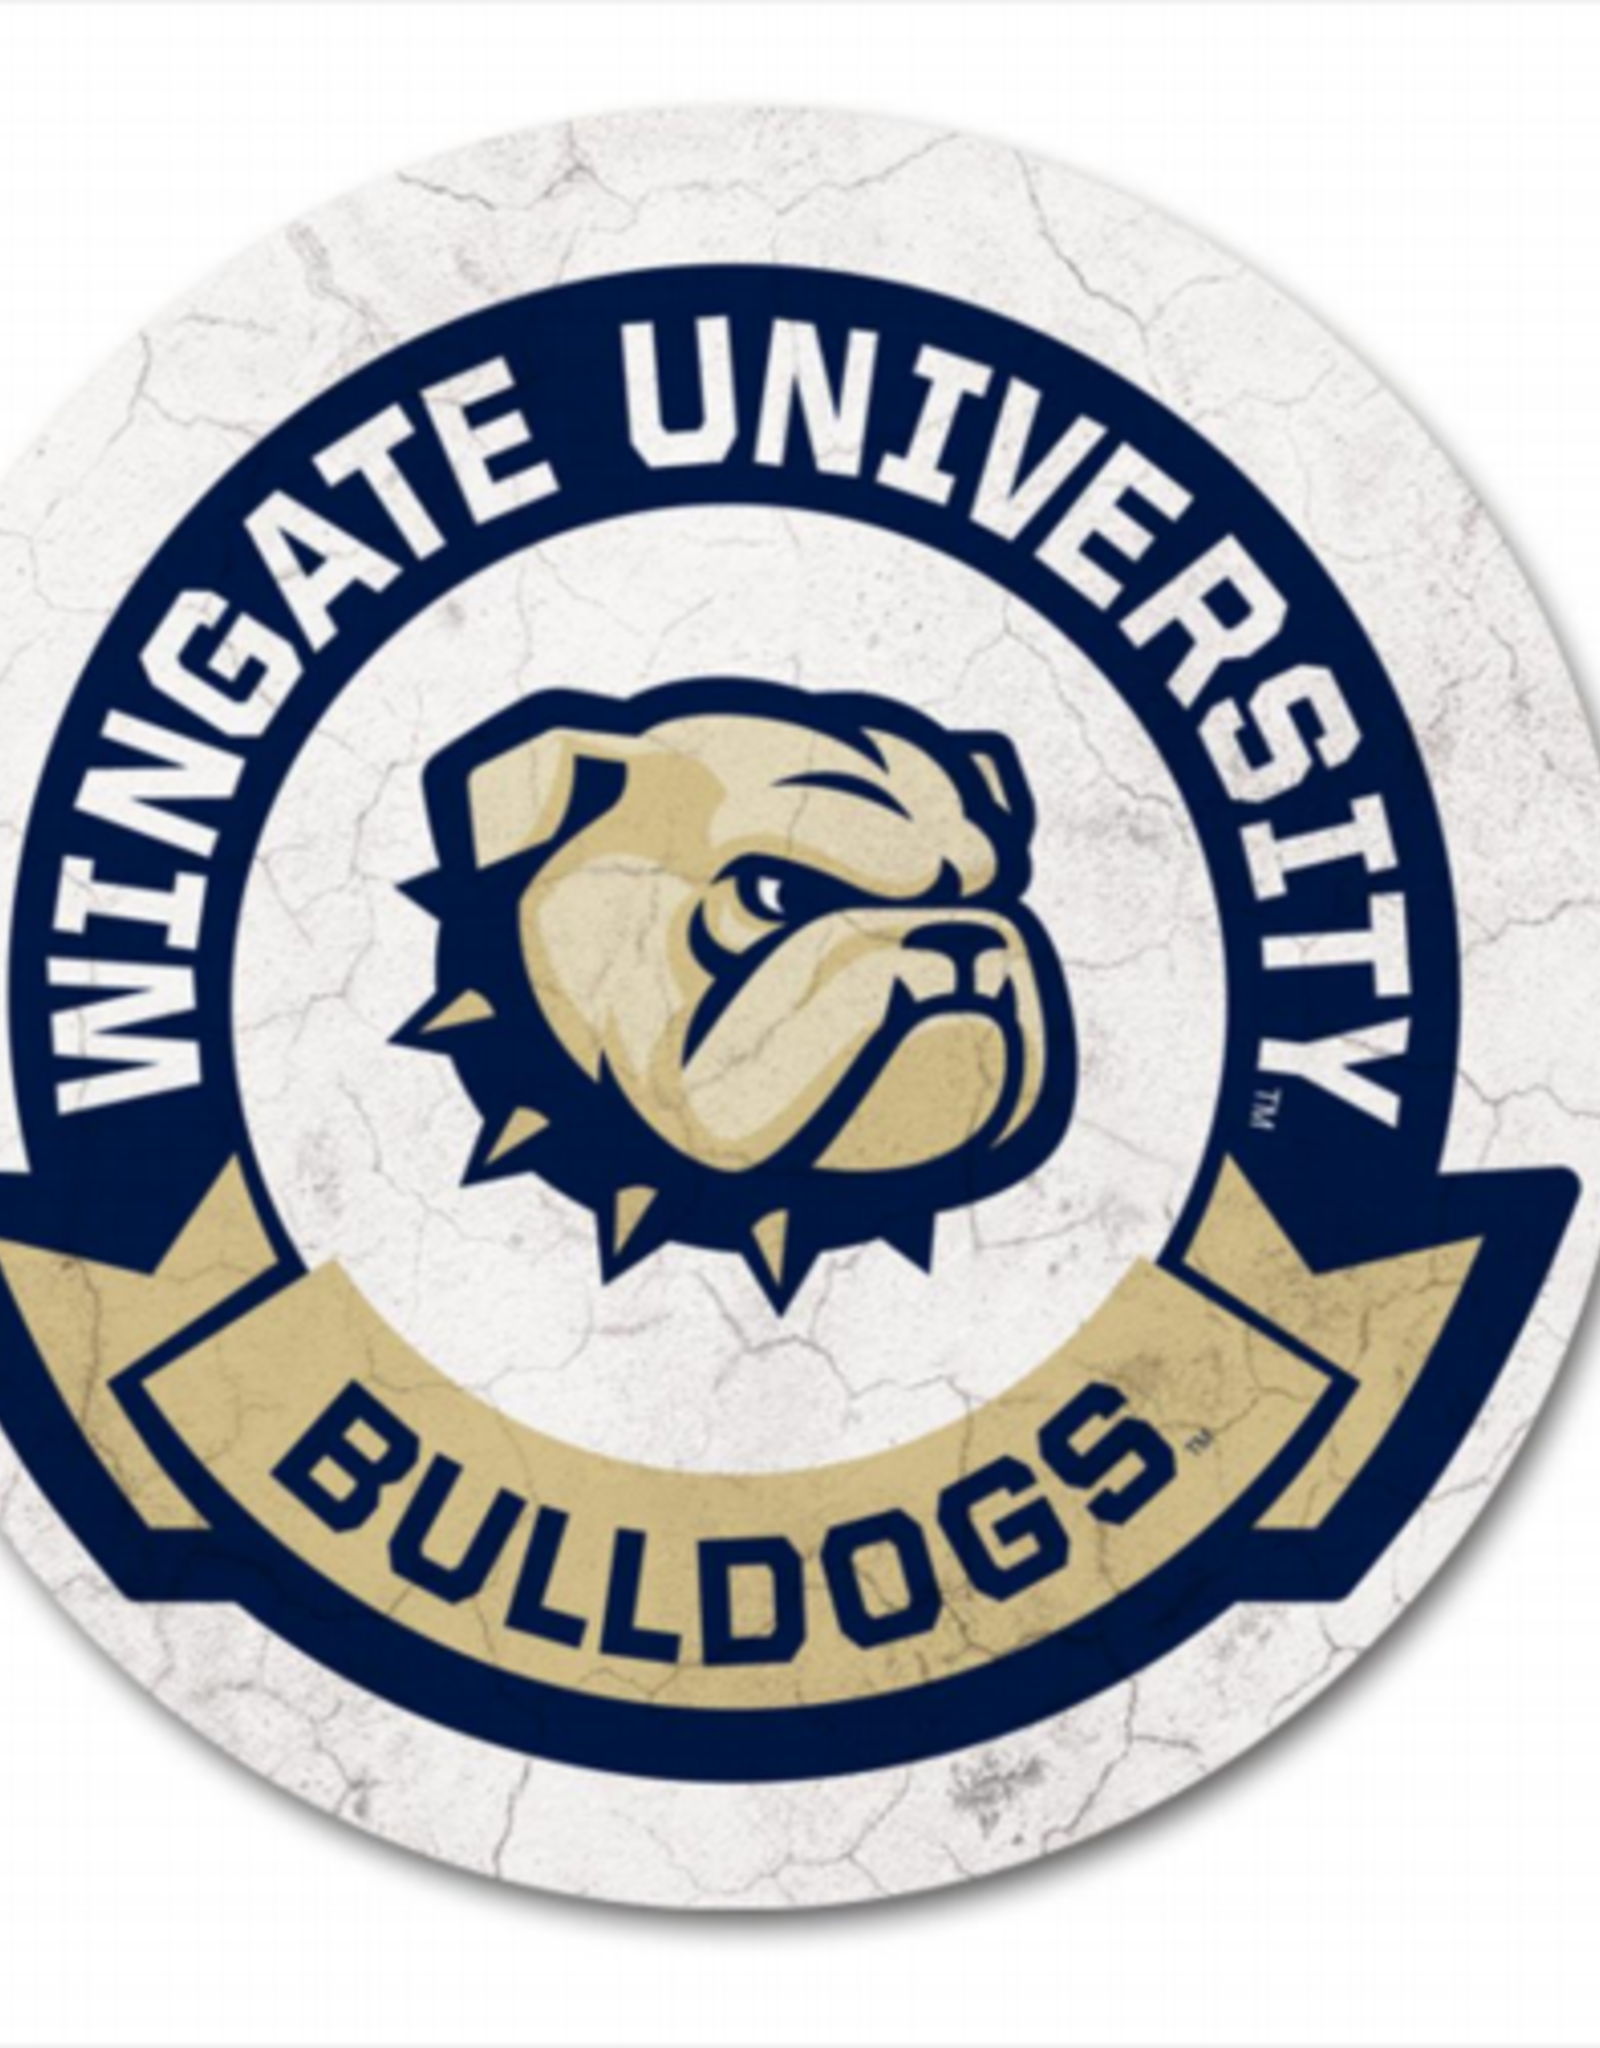 Legacy New Dog Head  WU Bulldogs Single Stone Coaster